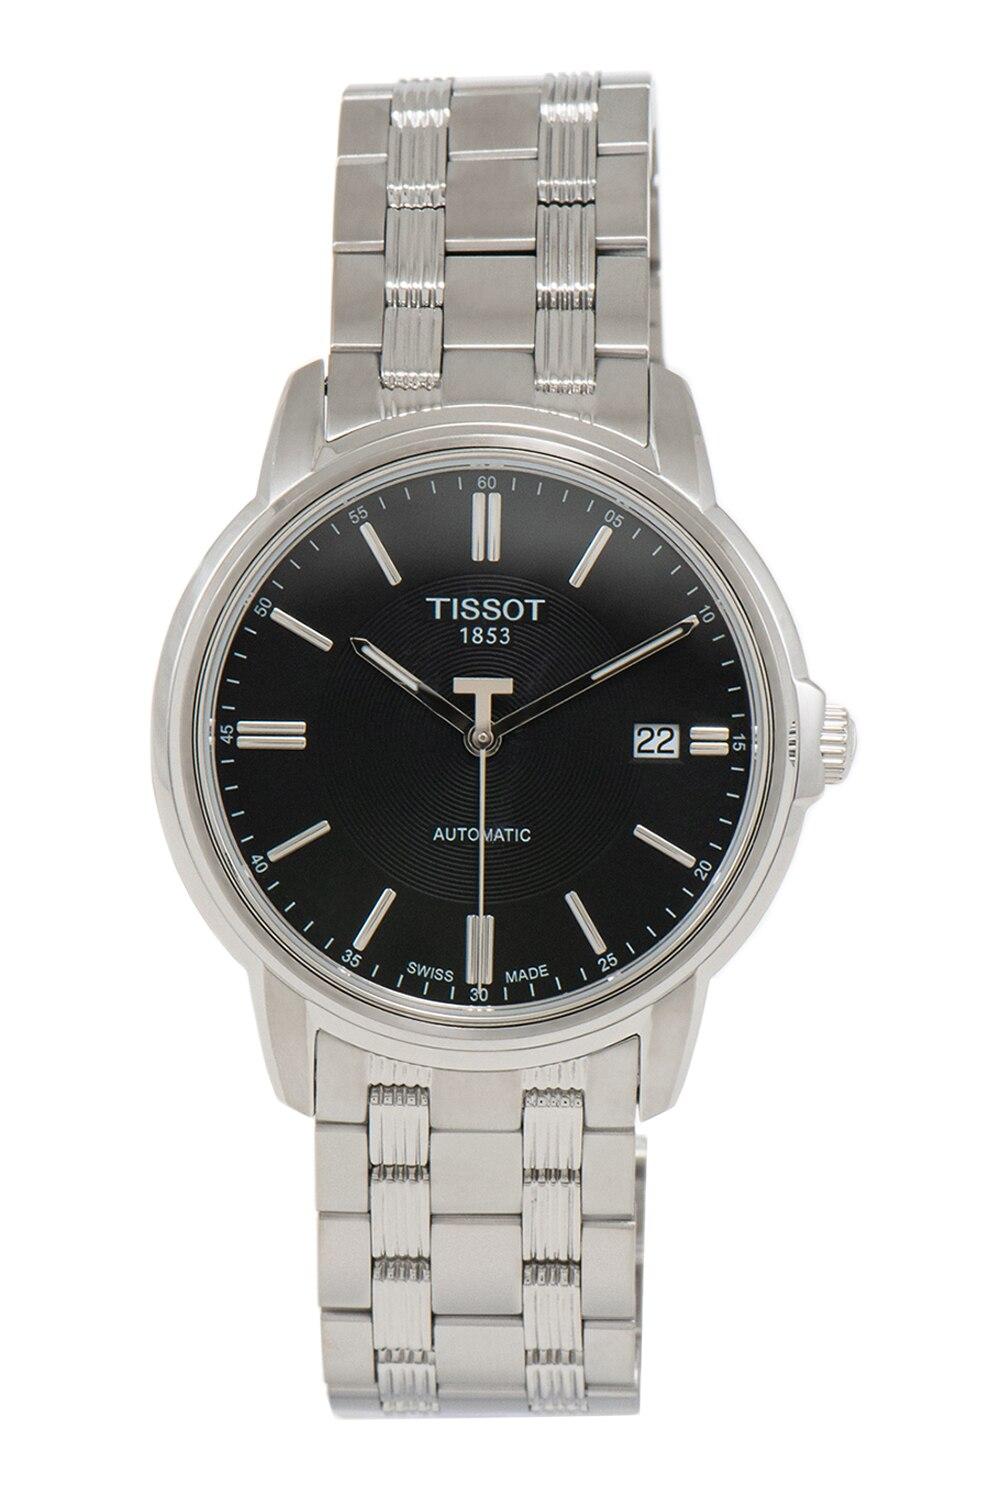 Fotografie Tissot, Ceas automatic cu bratara din otel inoxidabil, Argintiu